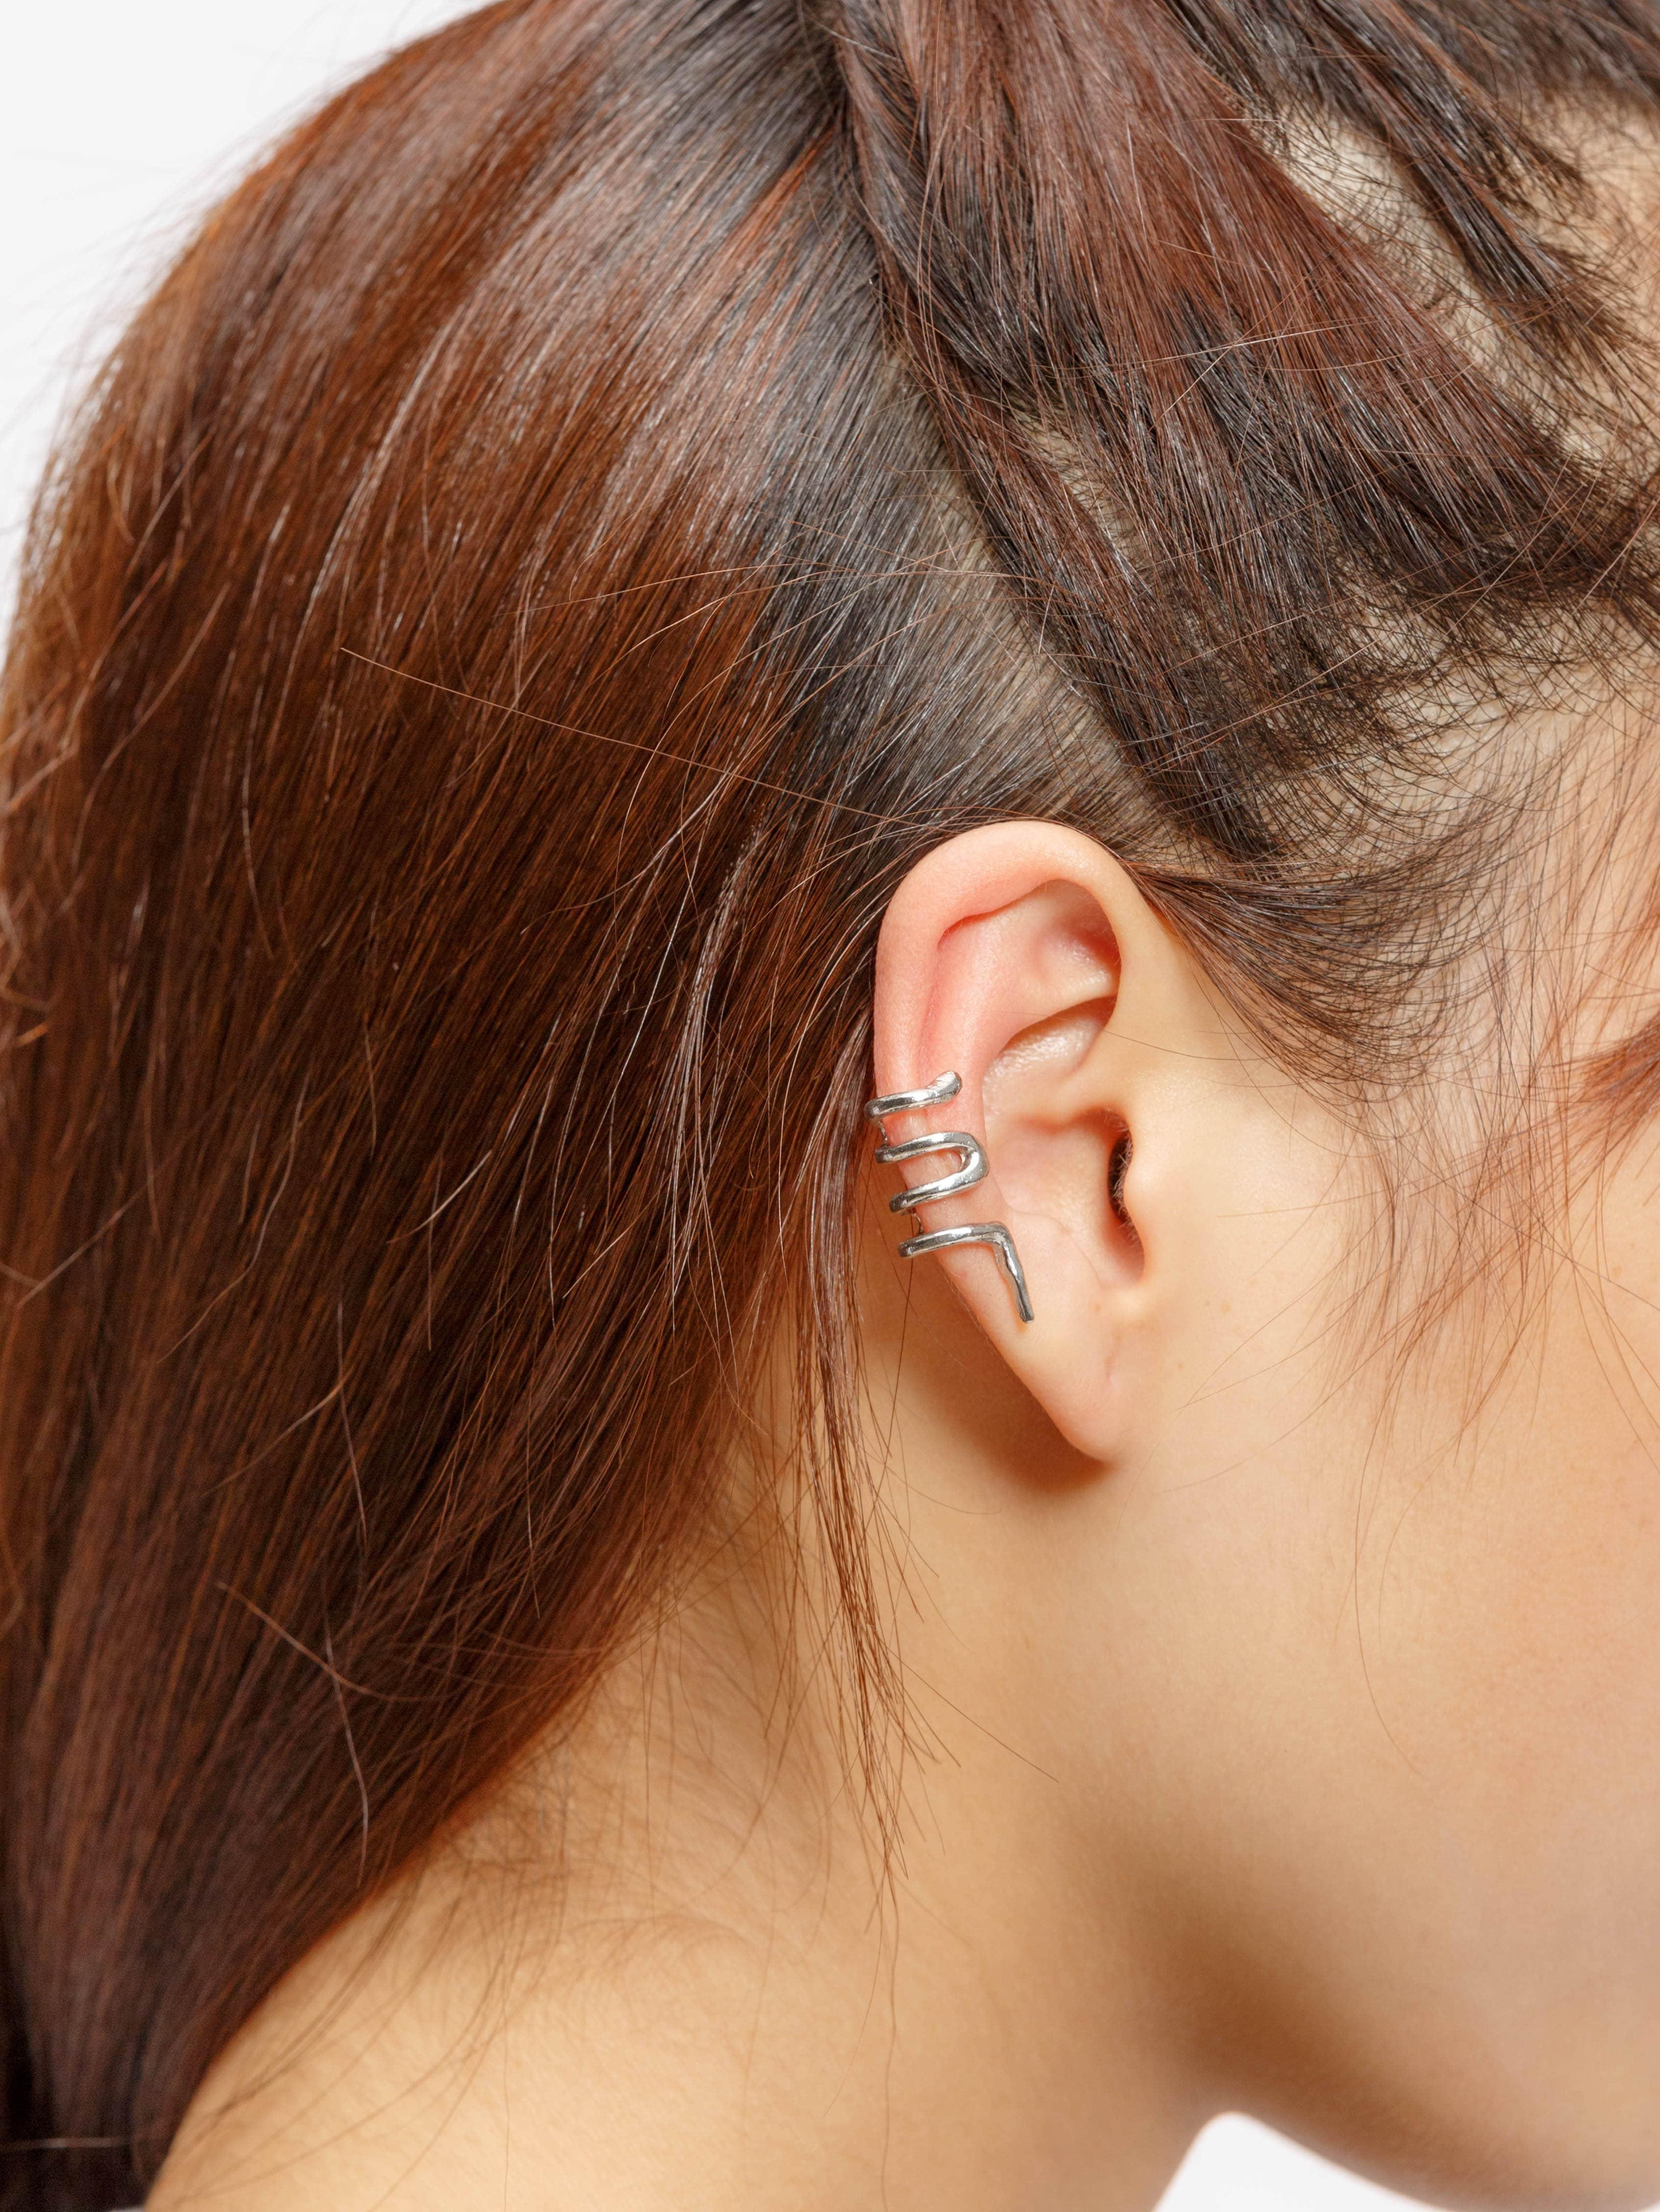 Snake Shaped Ear Cuff 1pc 1pc 6ed1053 1fg00 0ba0